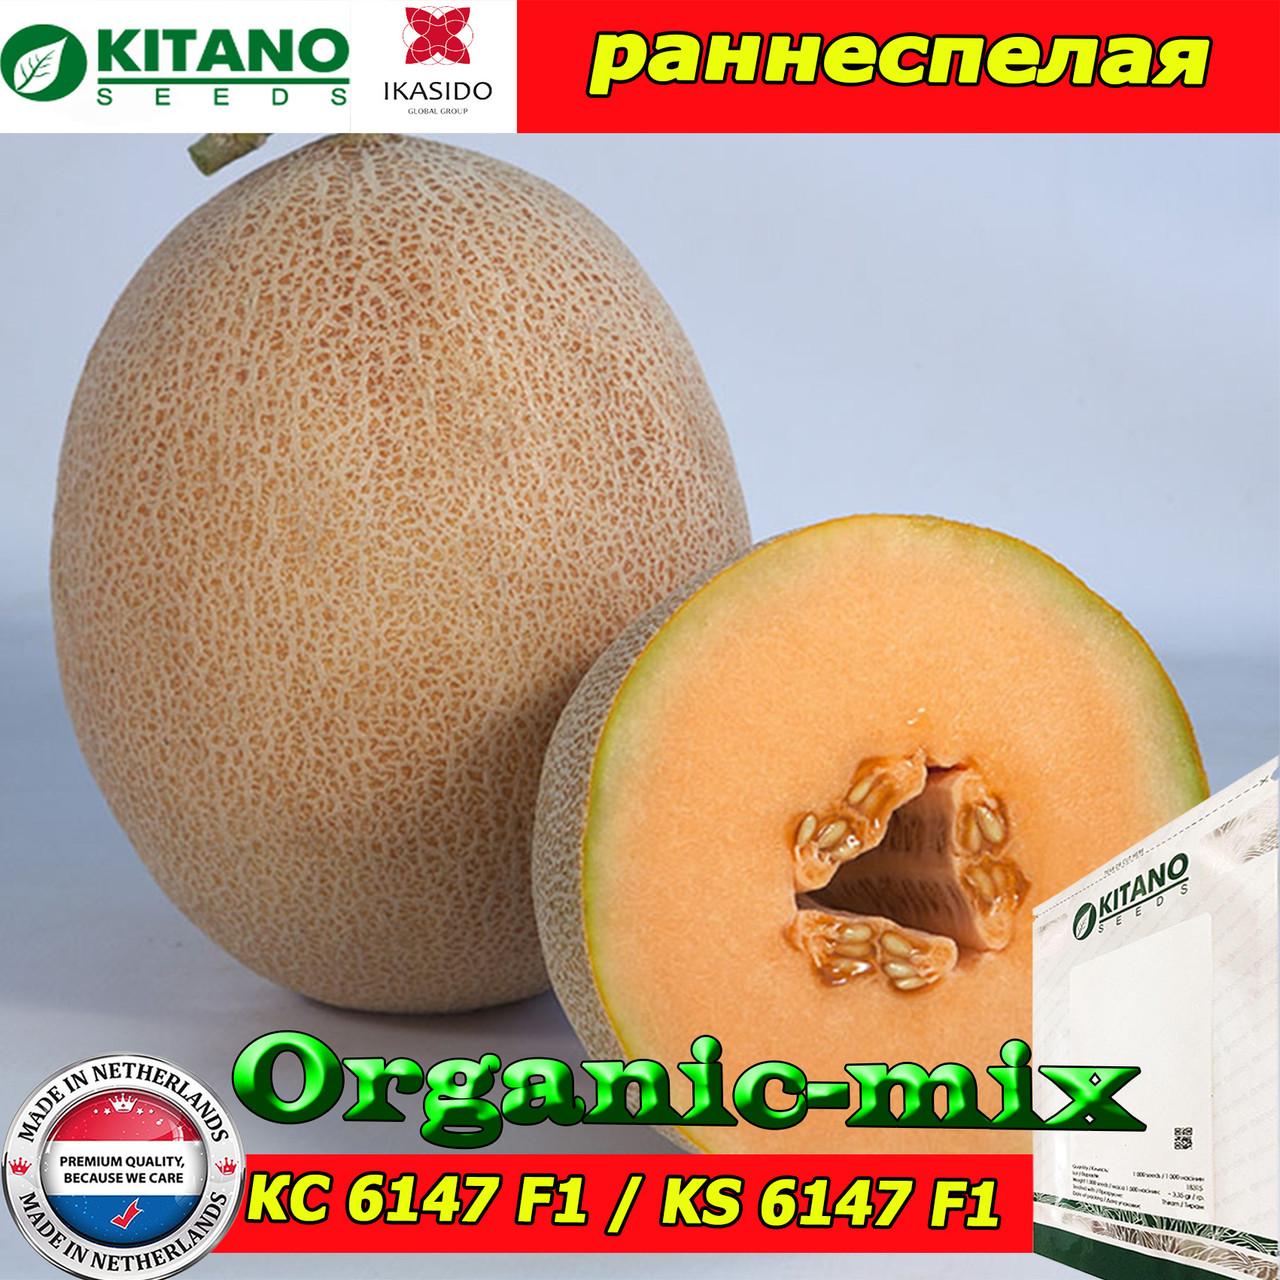 Дыня КС 6147 F1 / KS 6147 F1 (ранеспелая), 100 семян ТМ Kitano Seeds (Нидерланды)